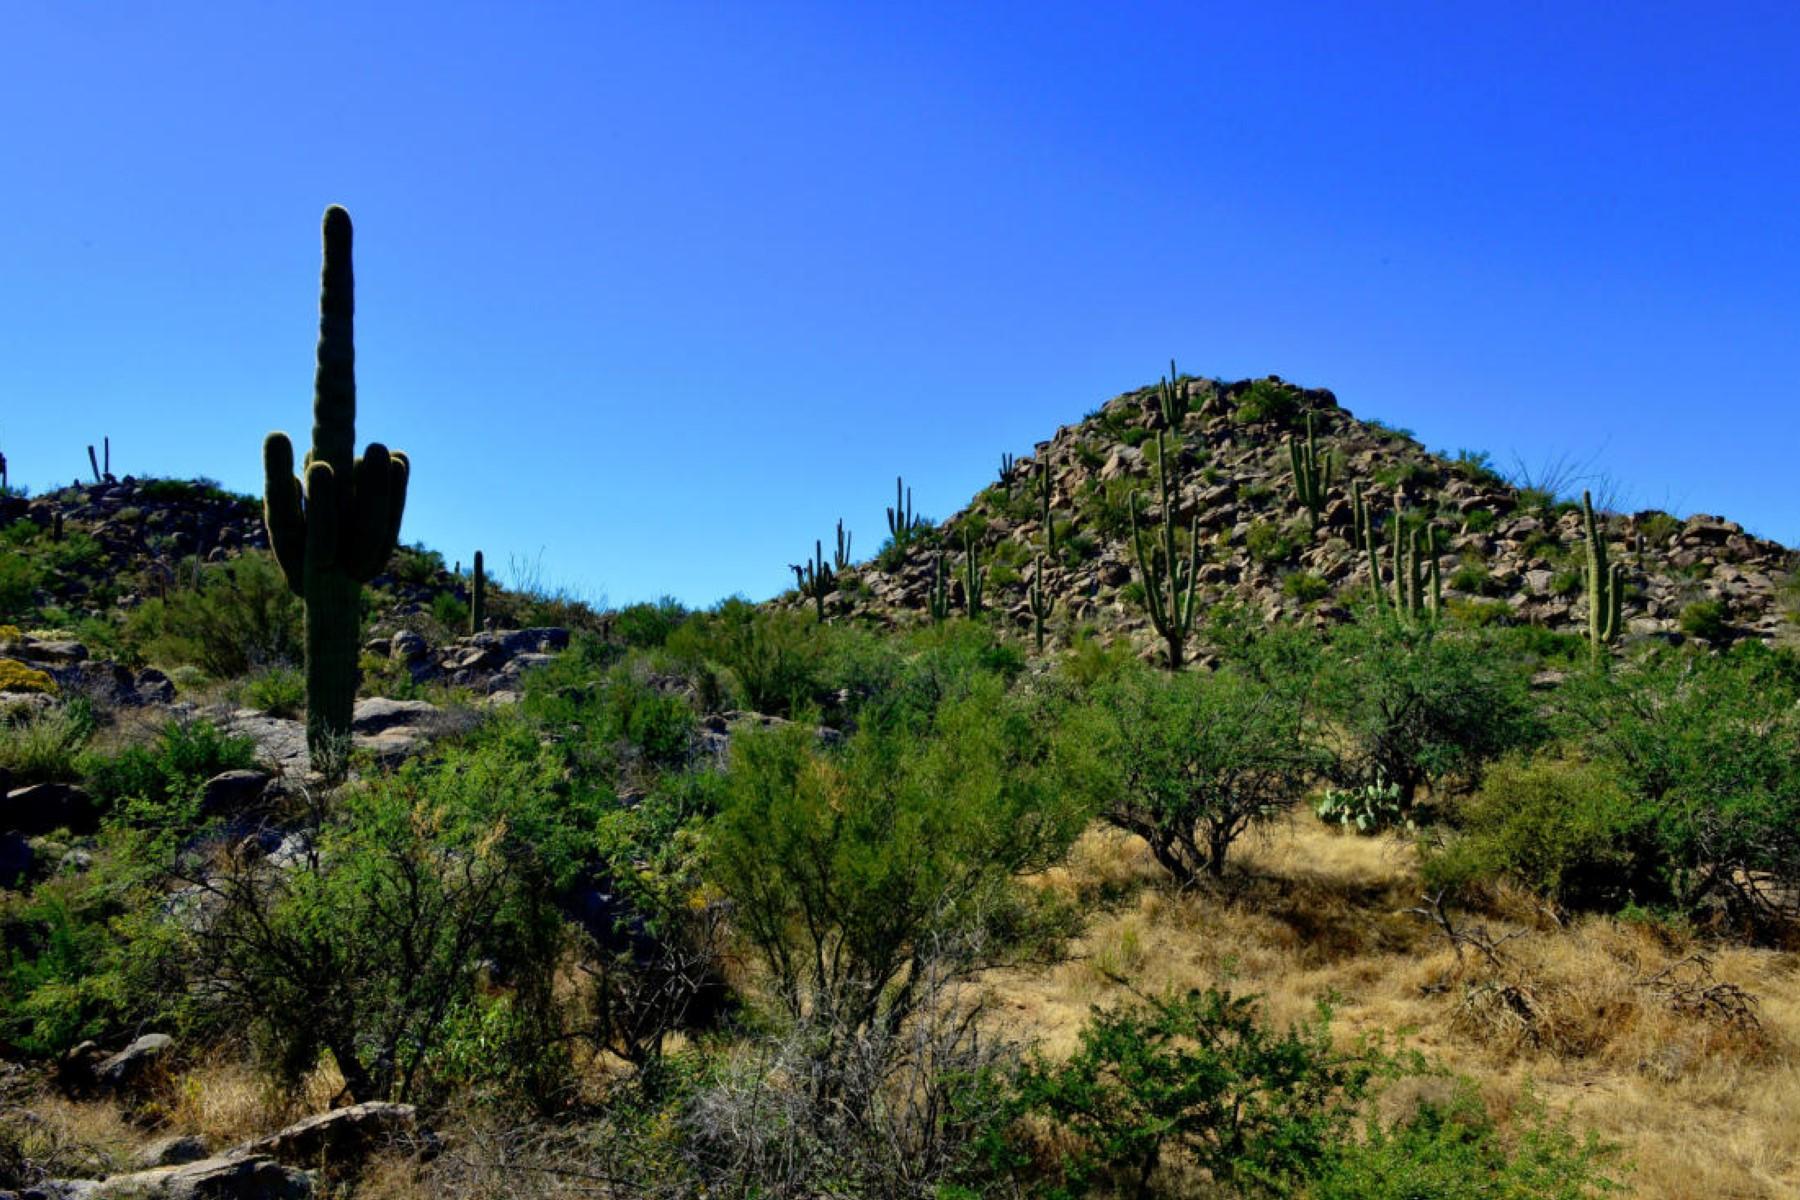 Terreno por un Venta en Private Homesite With Dramatic Rock Outcroppings, Saguaros & Mountain Views 953 W Granite Gorge Drive W #321 Oro Valley, Arizona 85755 Estados Unidos